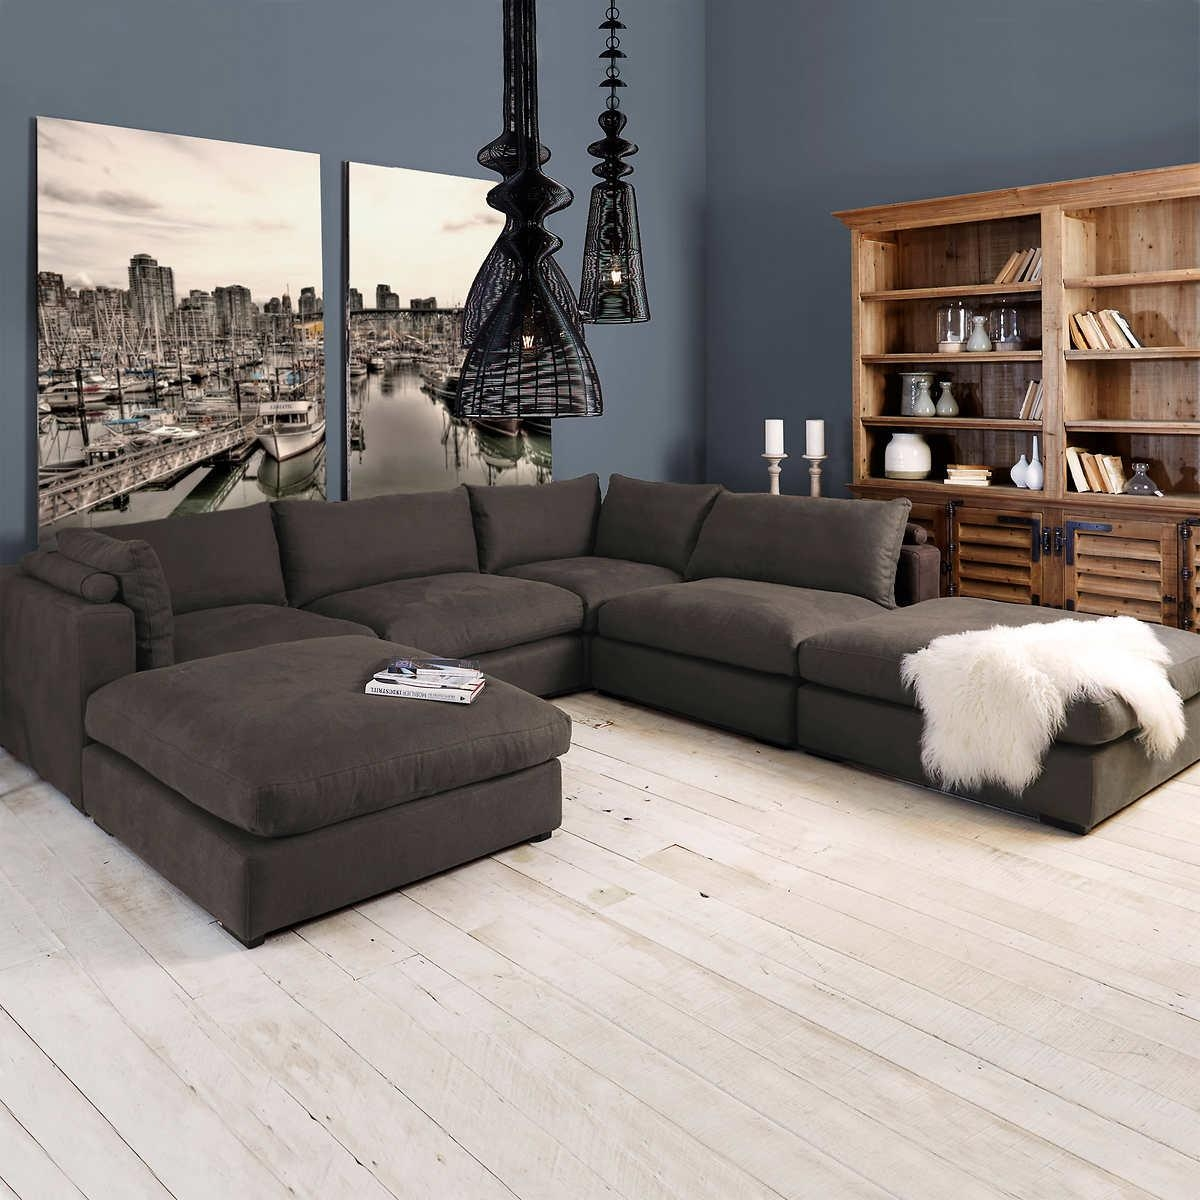 Sofas Center : Modular Sectional Sofa Leather1 900X700 Free Inside Leather Modular Sectional Sofas (Image 17 of 20)